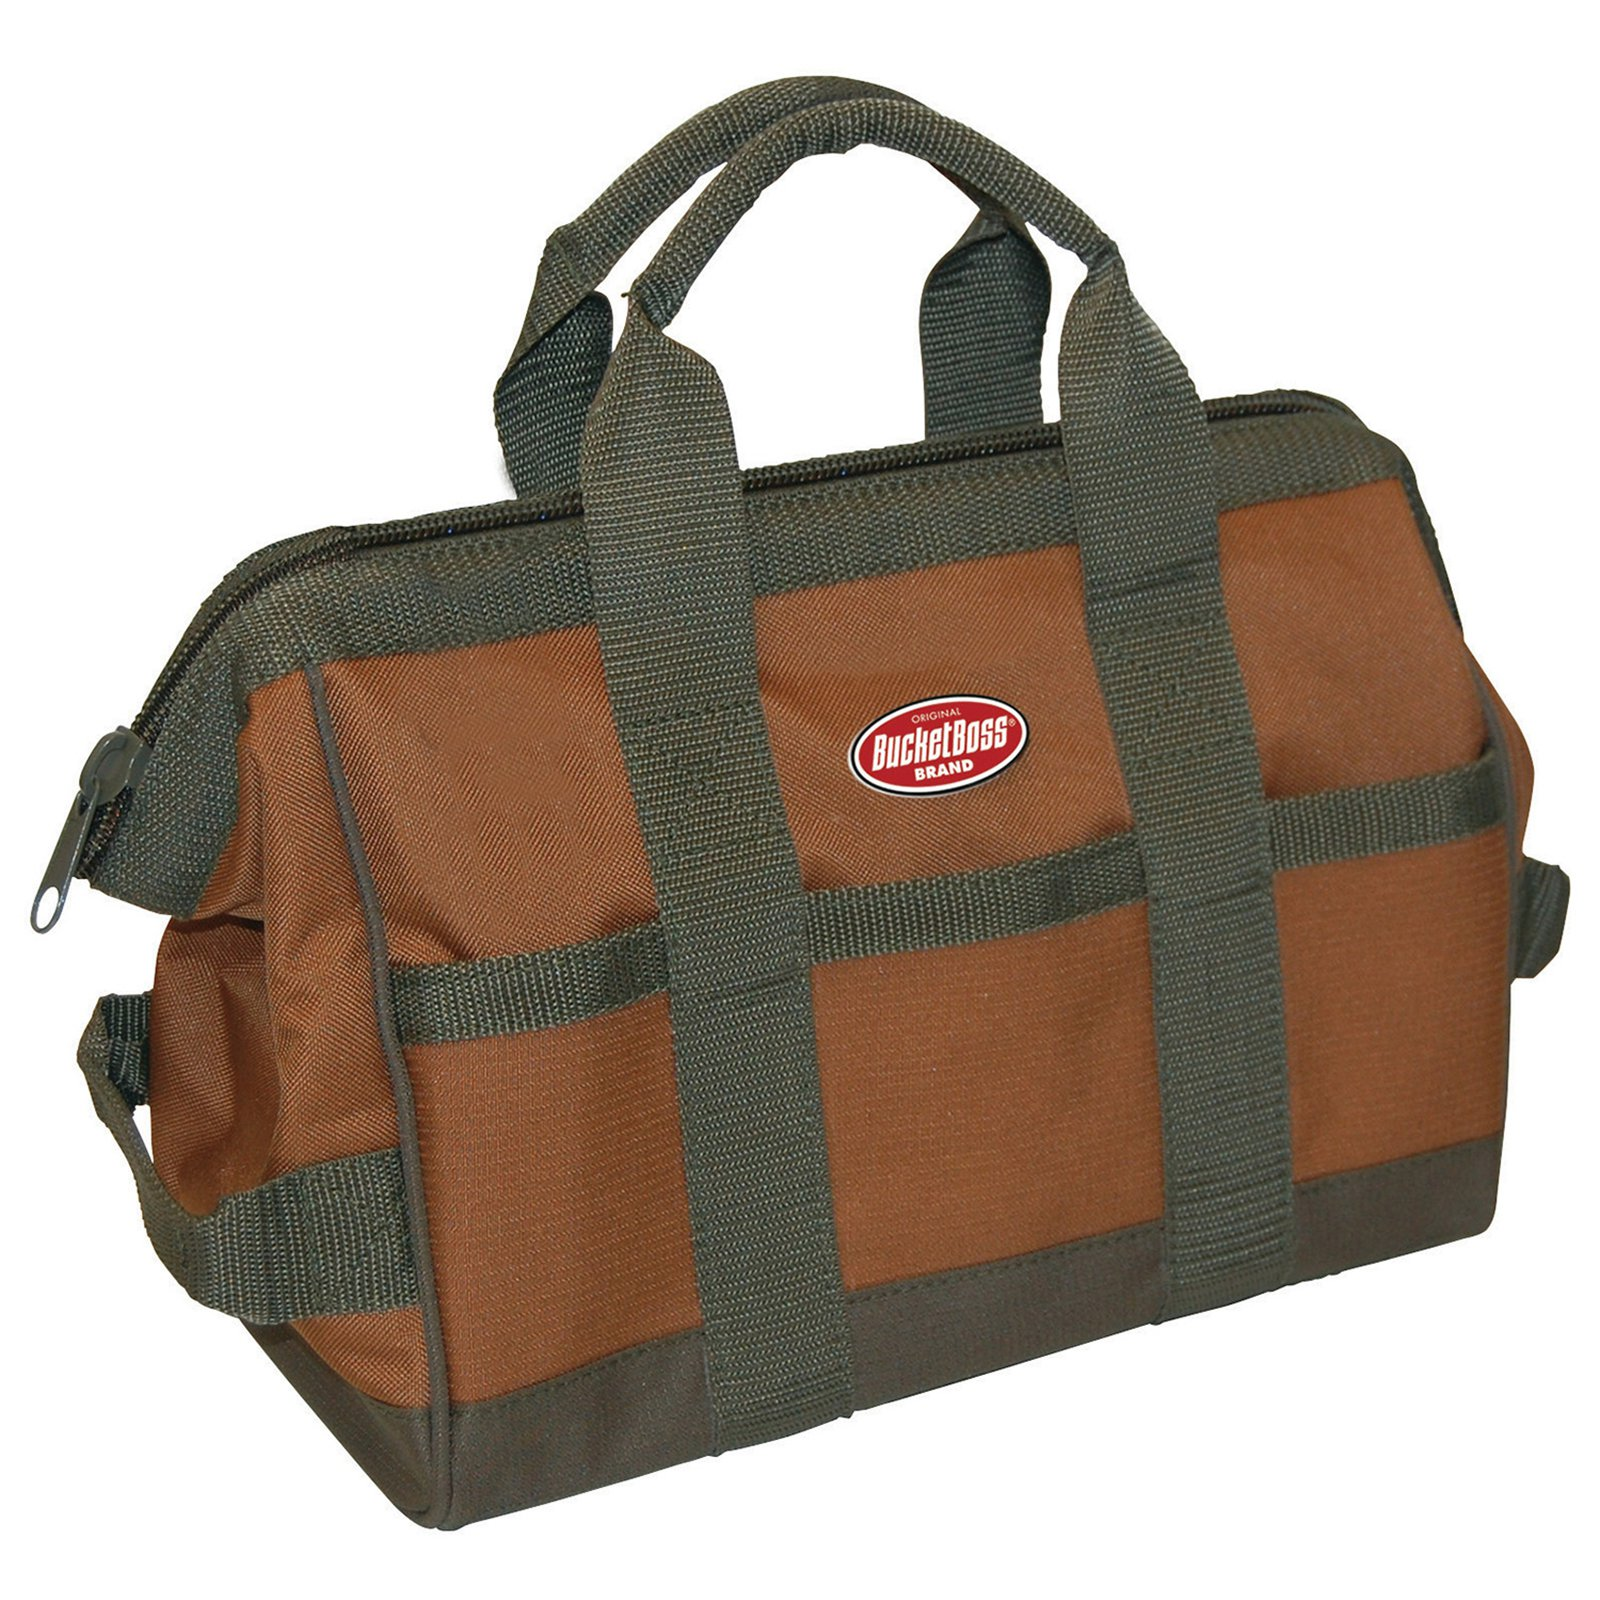 "Bucket Boss 60012 12"" X 7"" X 9"" Green & Brown Gatemouth Tool Bag by Pull'r Holdings Llc/bucketboss"